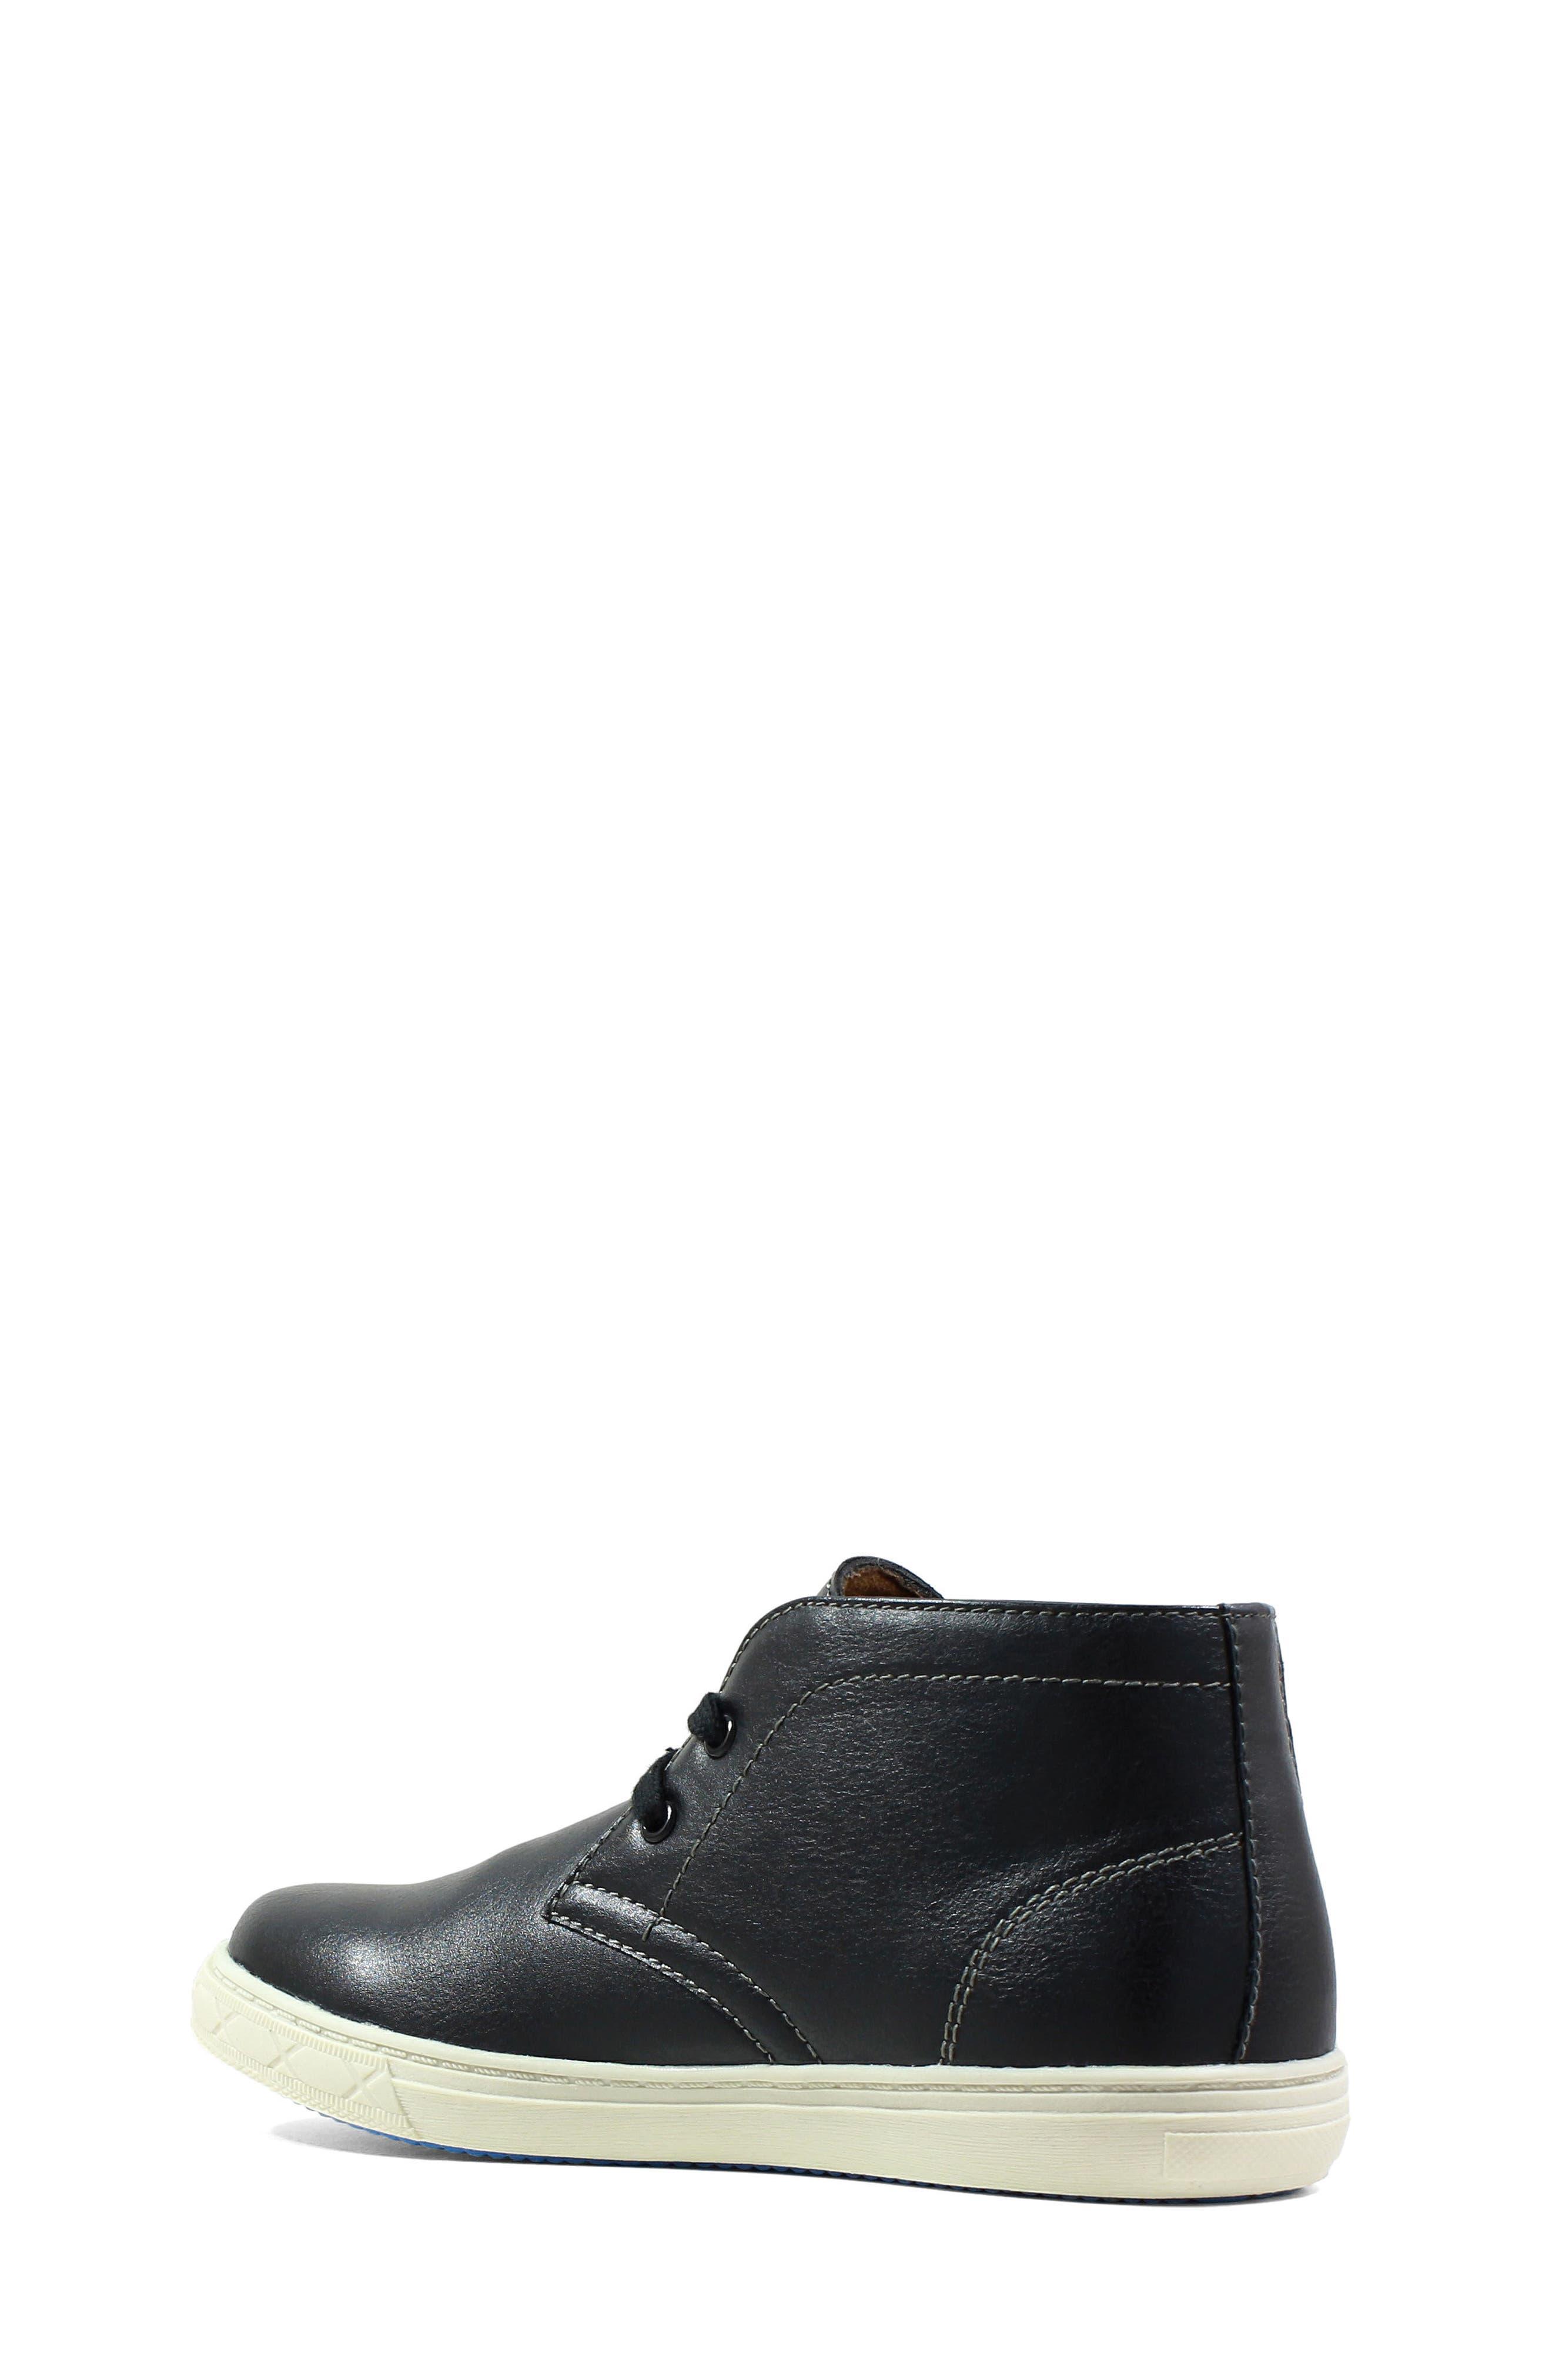 FLORSHEIM, Curb Chukka Sneaker Boot, Alternate thumbnail 2, color, 001